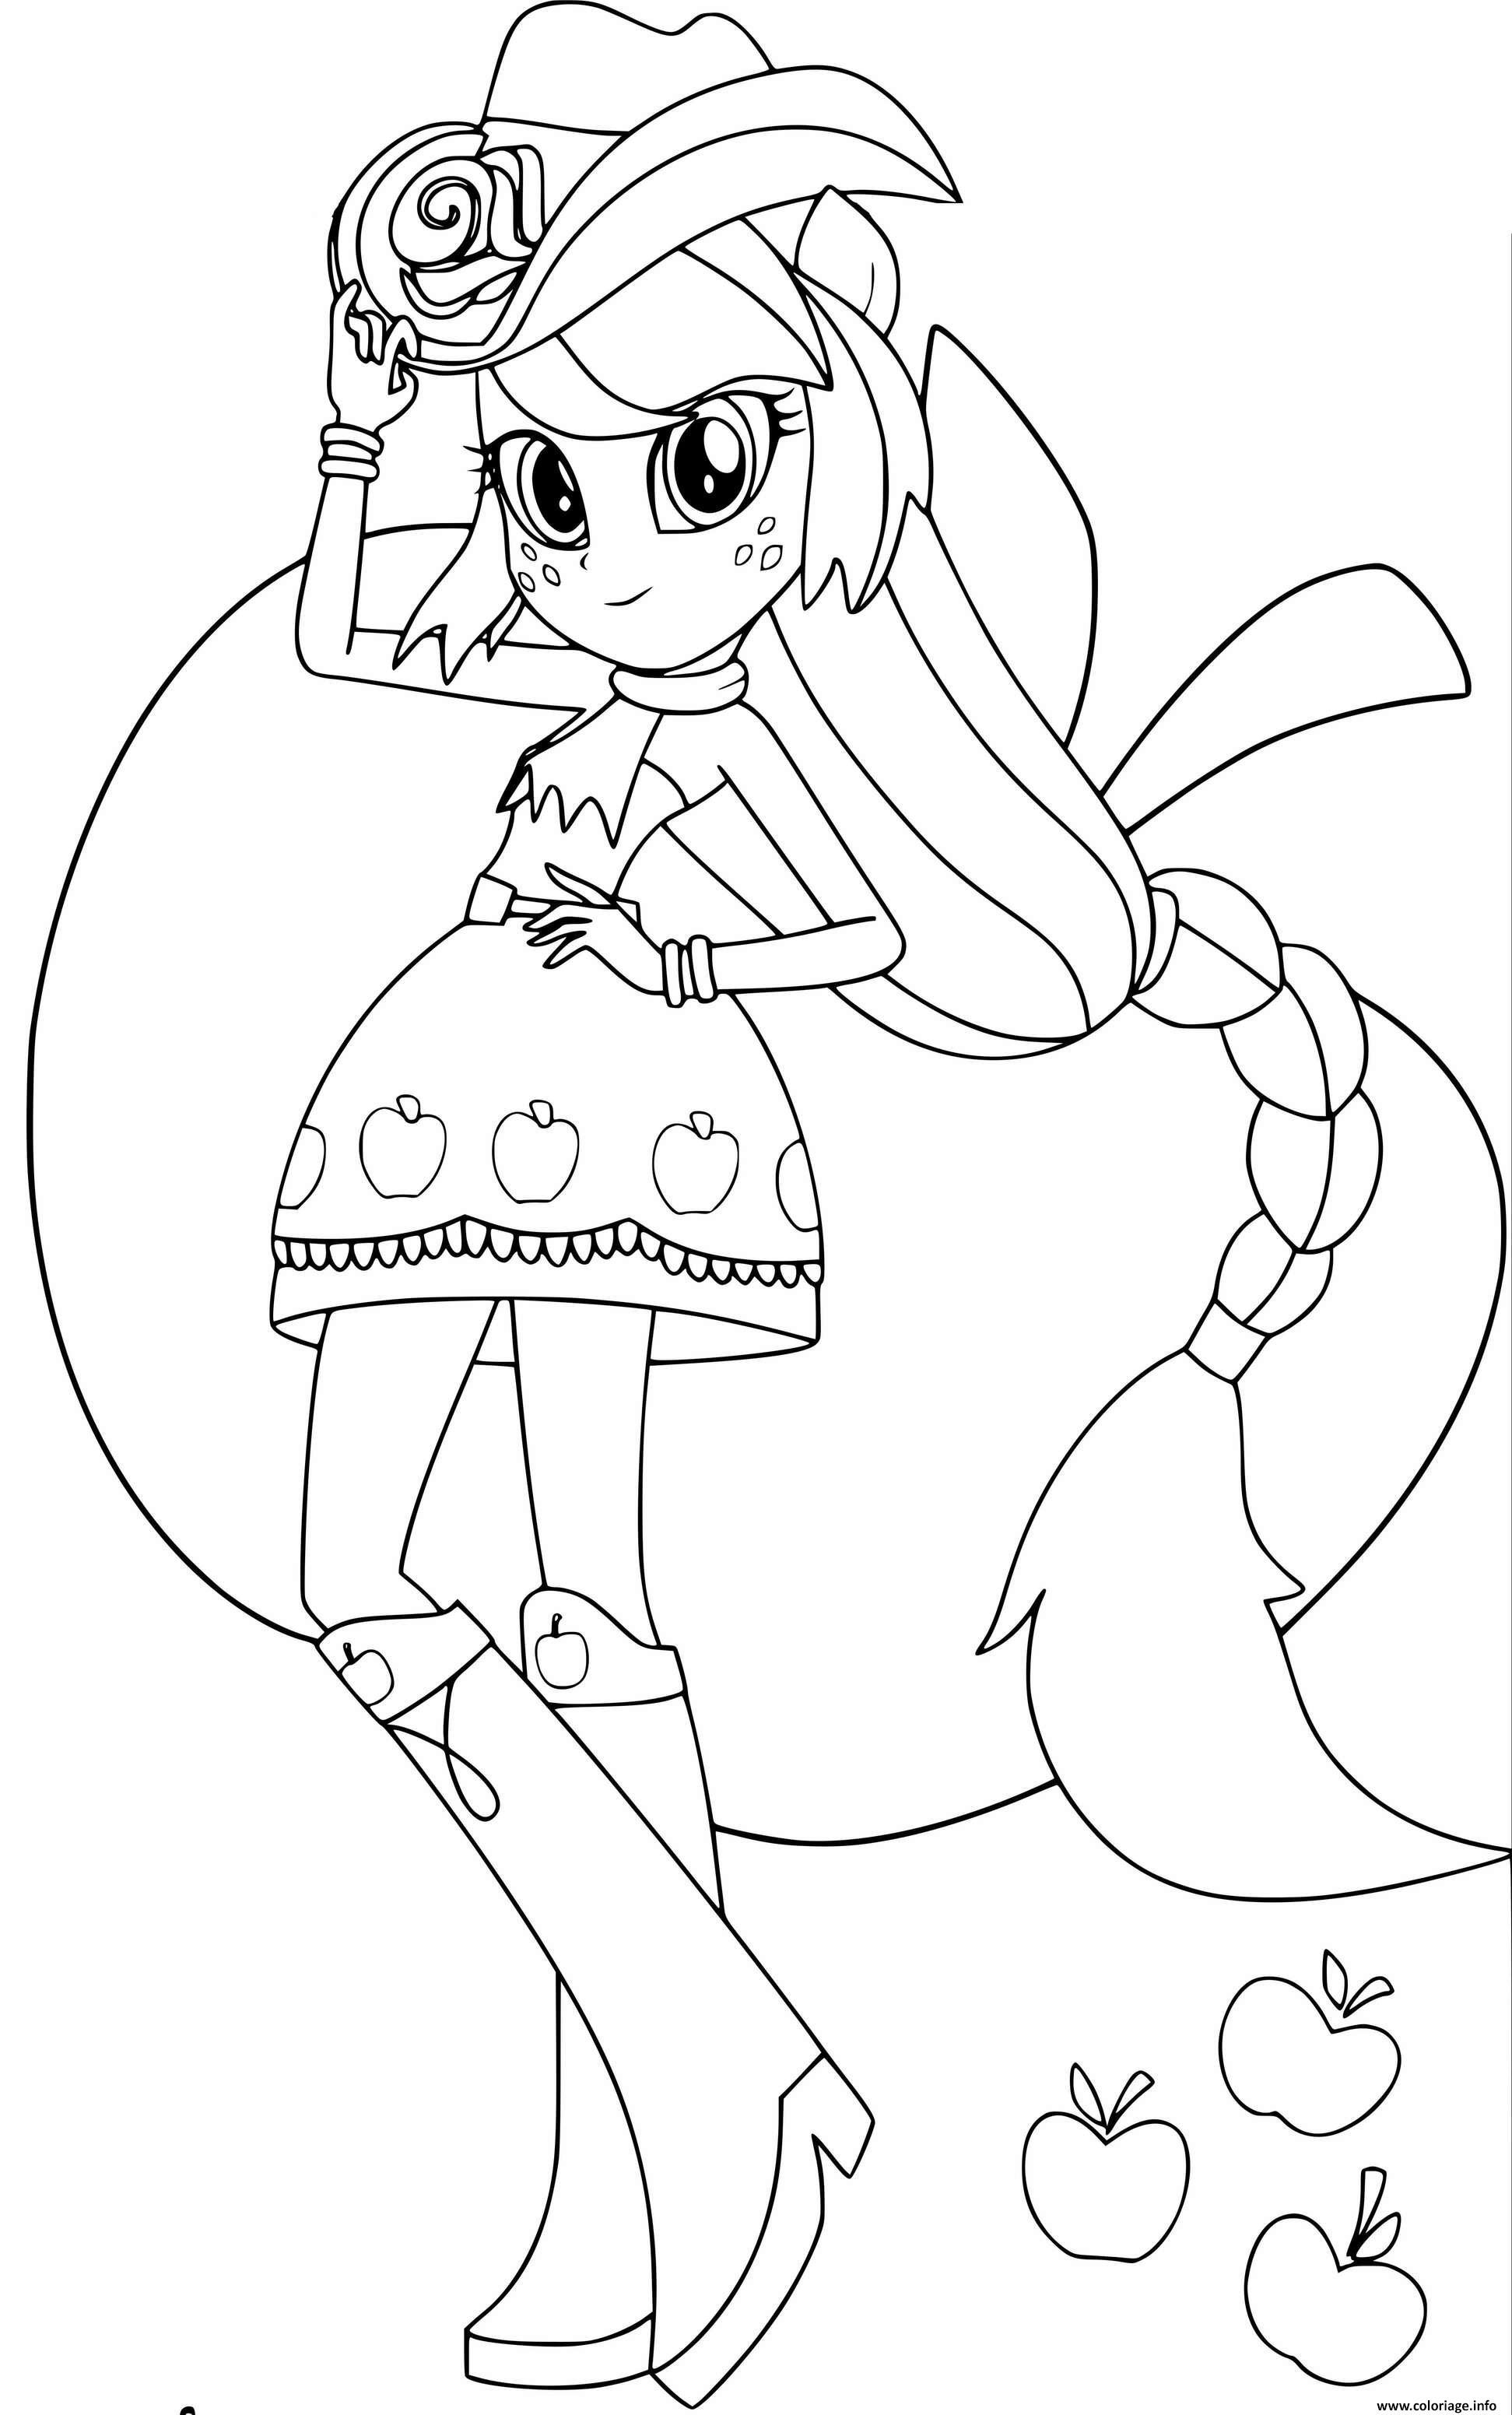 Coloriage My Little Pony Equestria Girls Applejack Printables - JeColorie.com